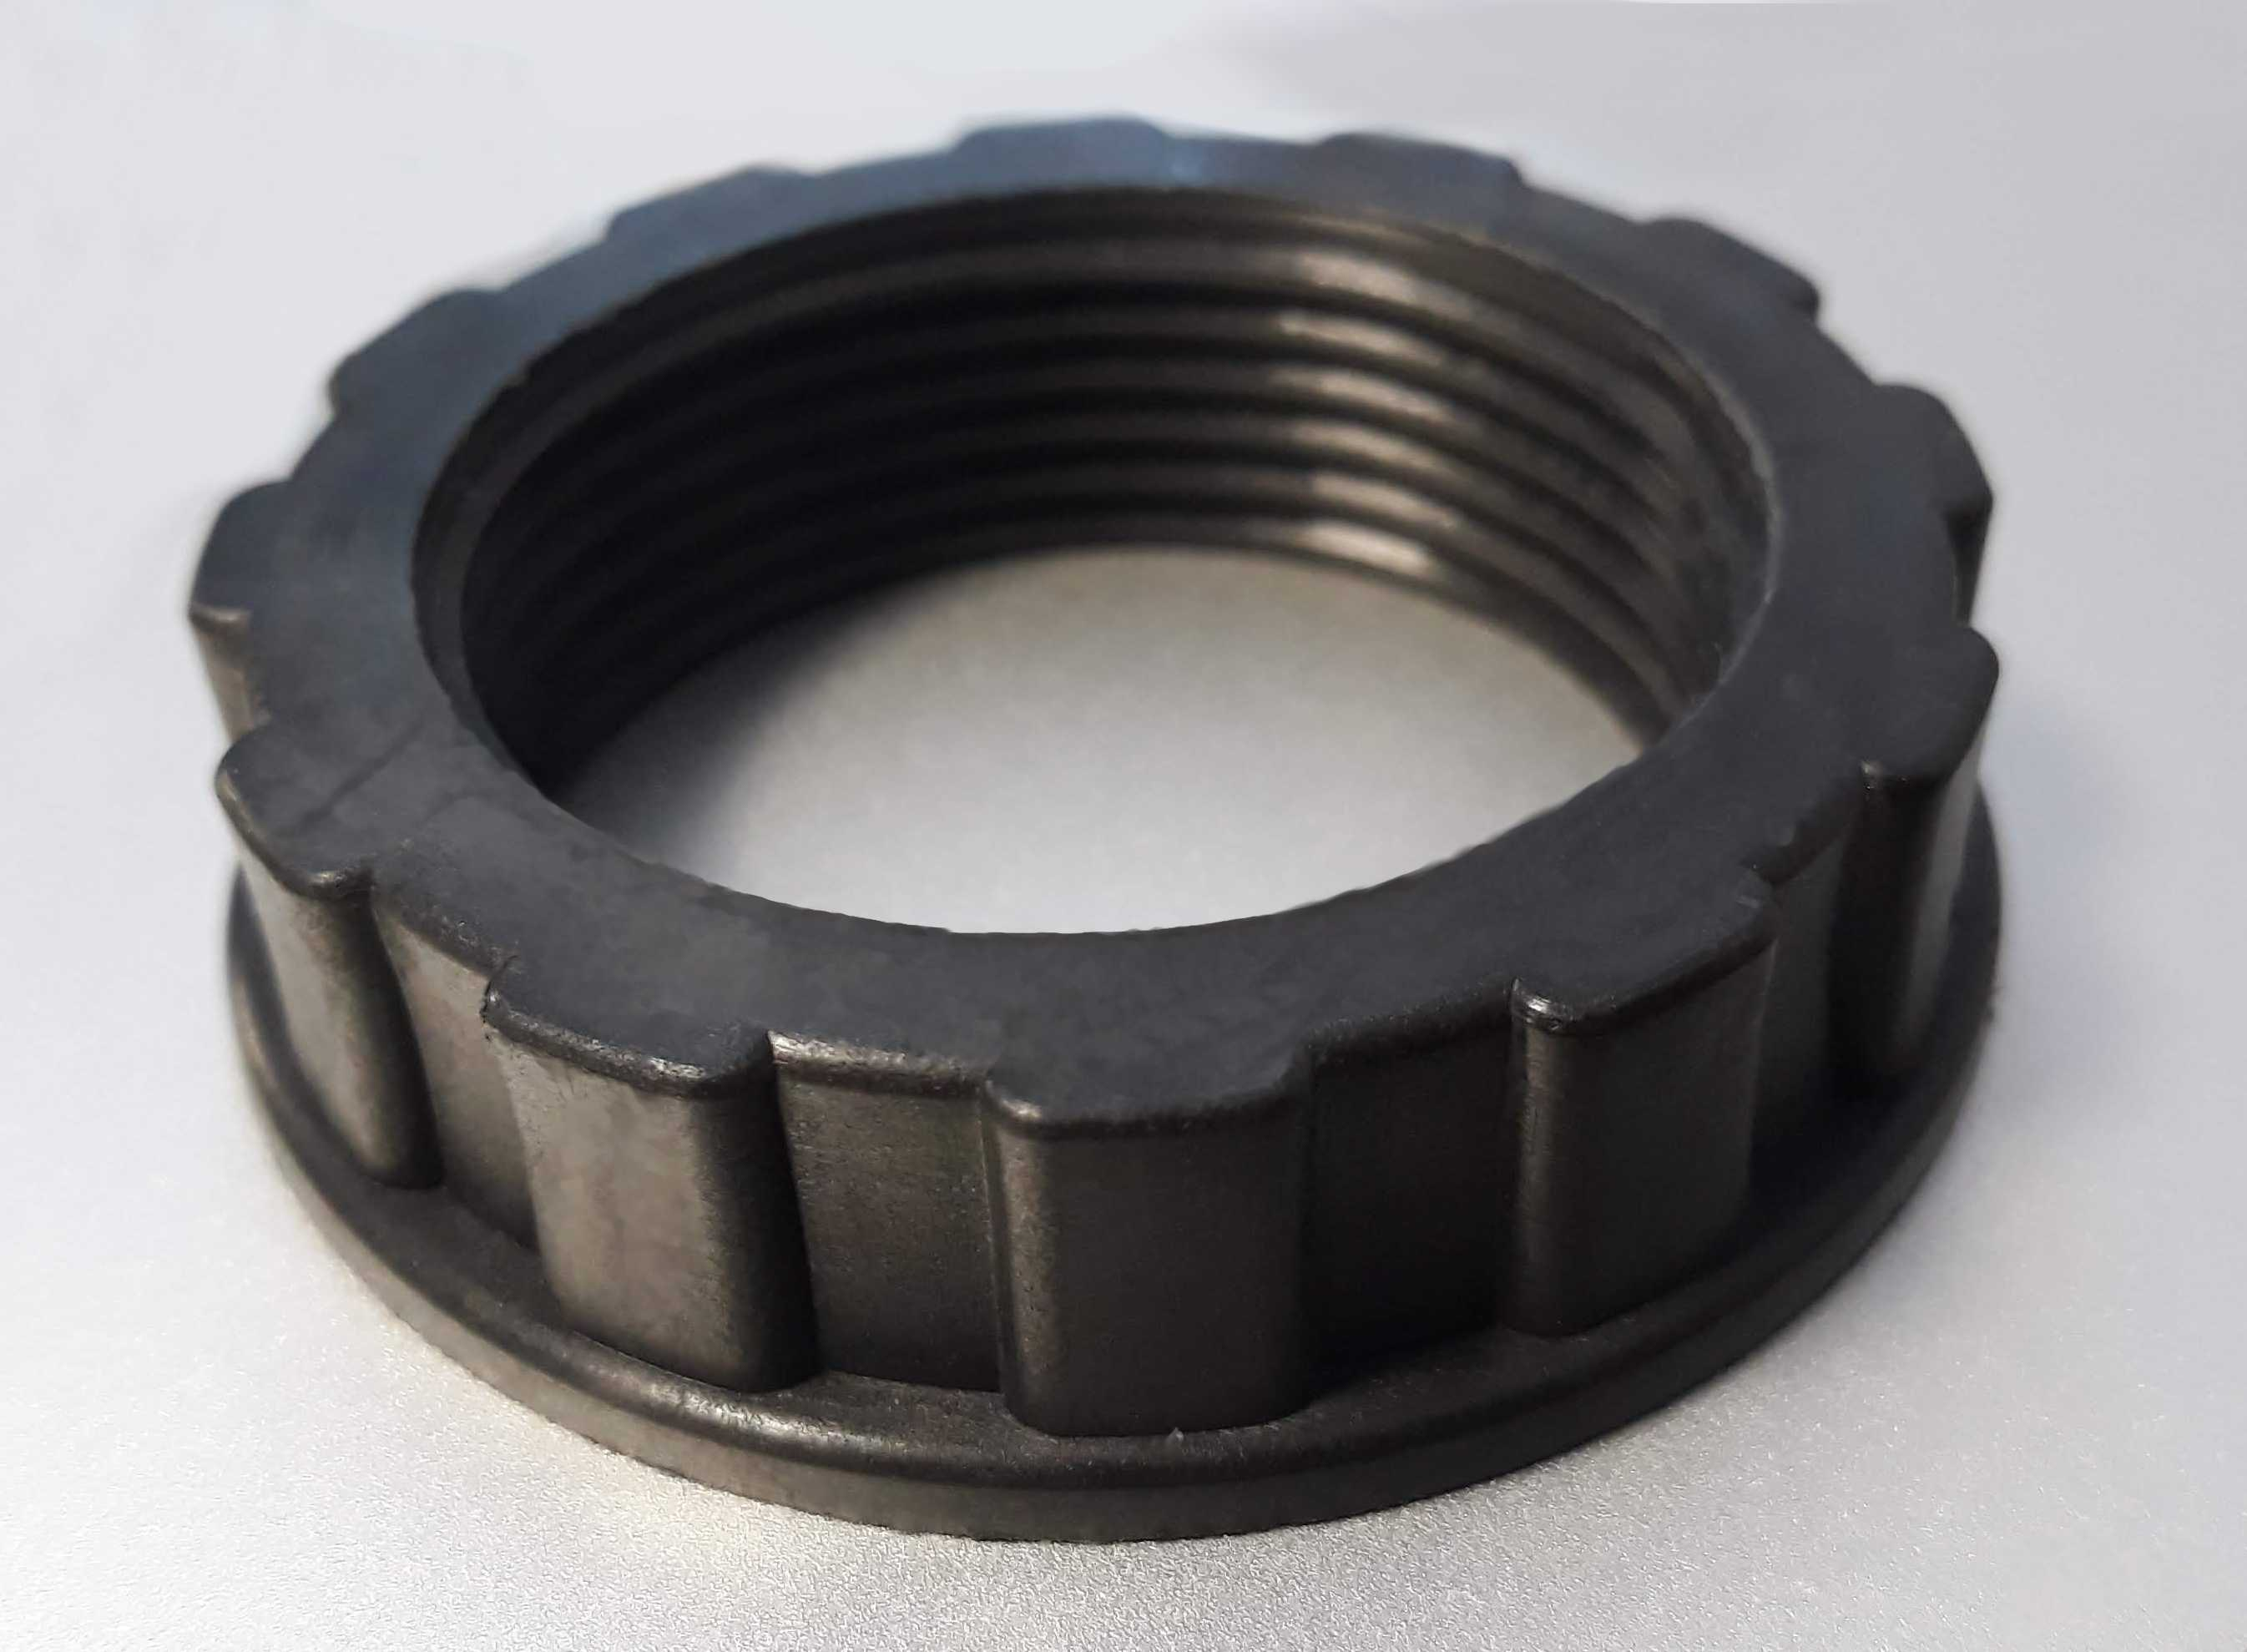 Reinforced plastic components